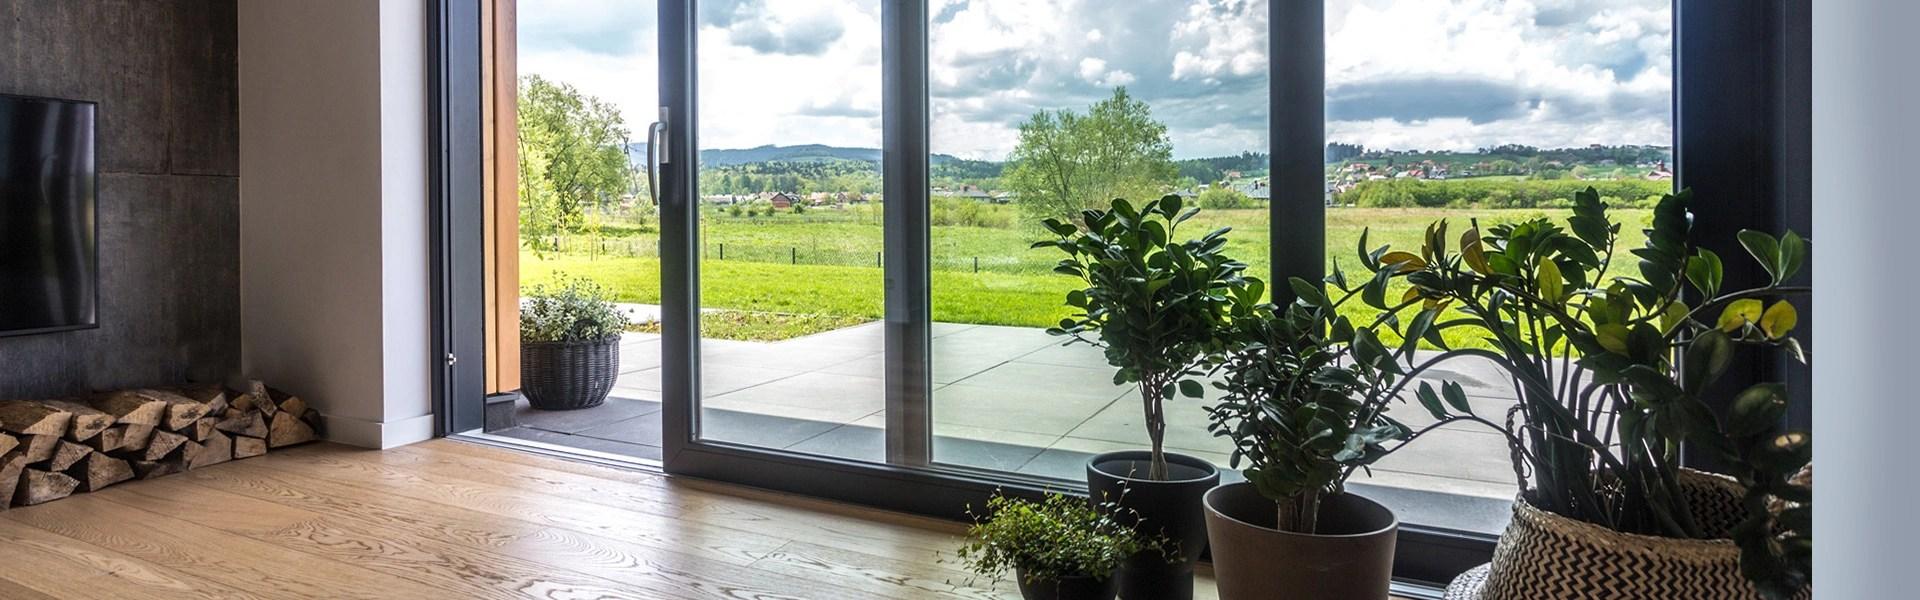 sliding and folding patio doors